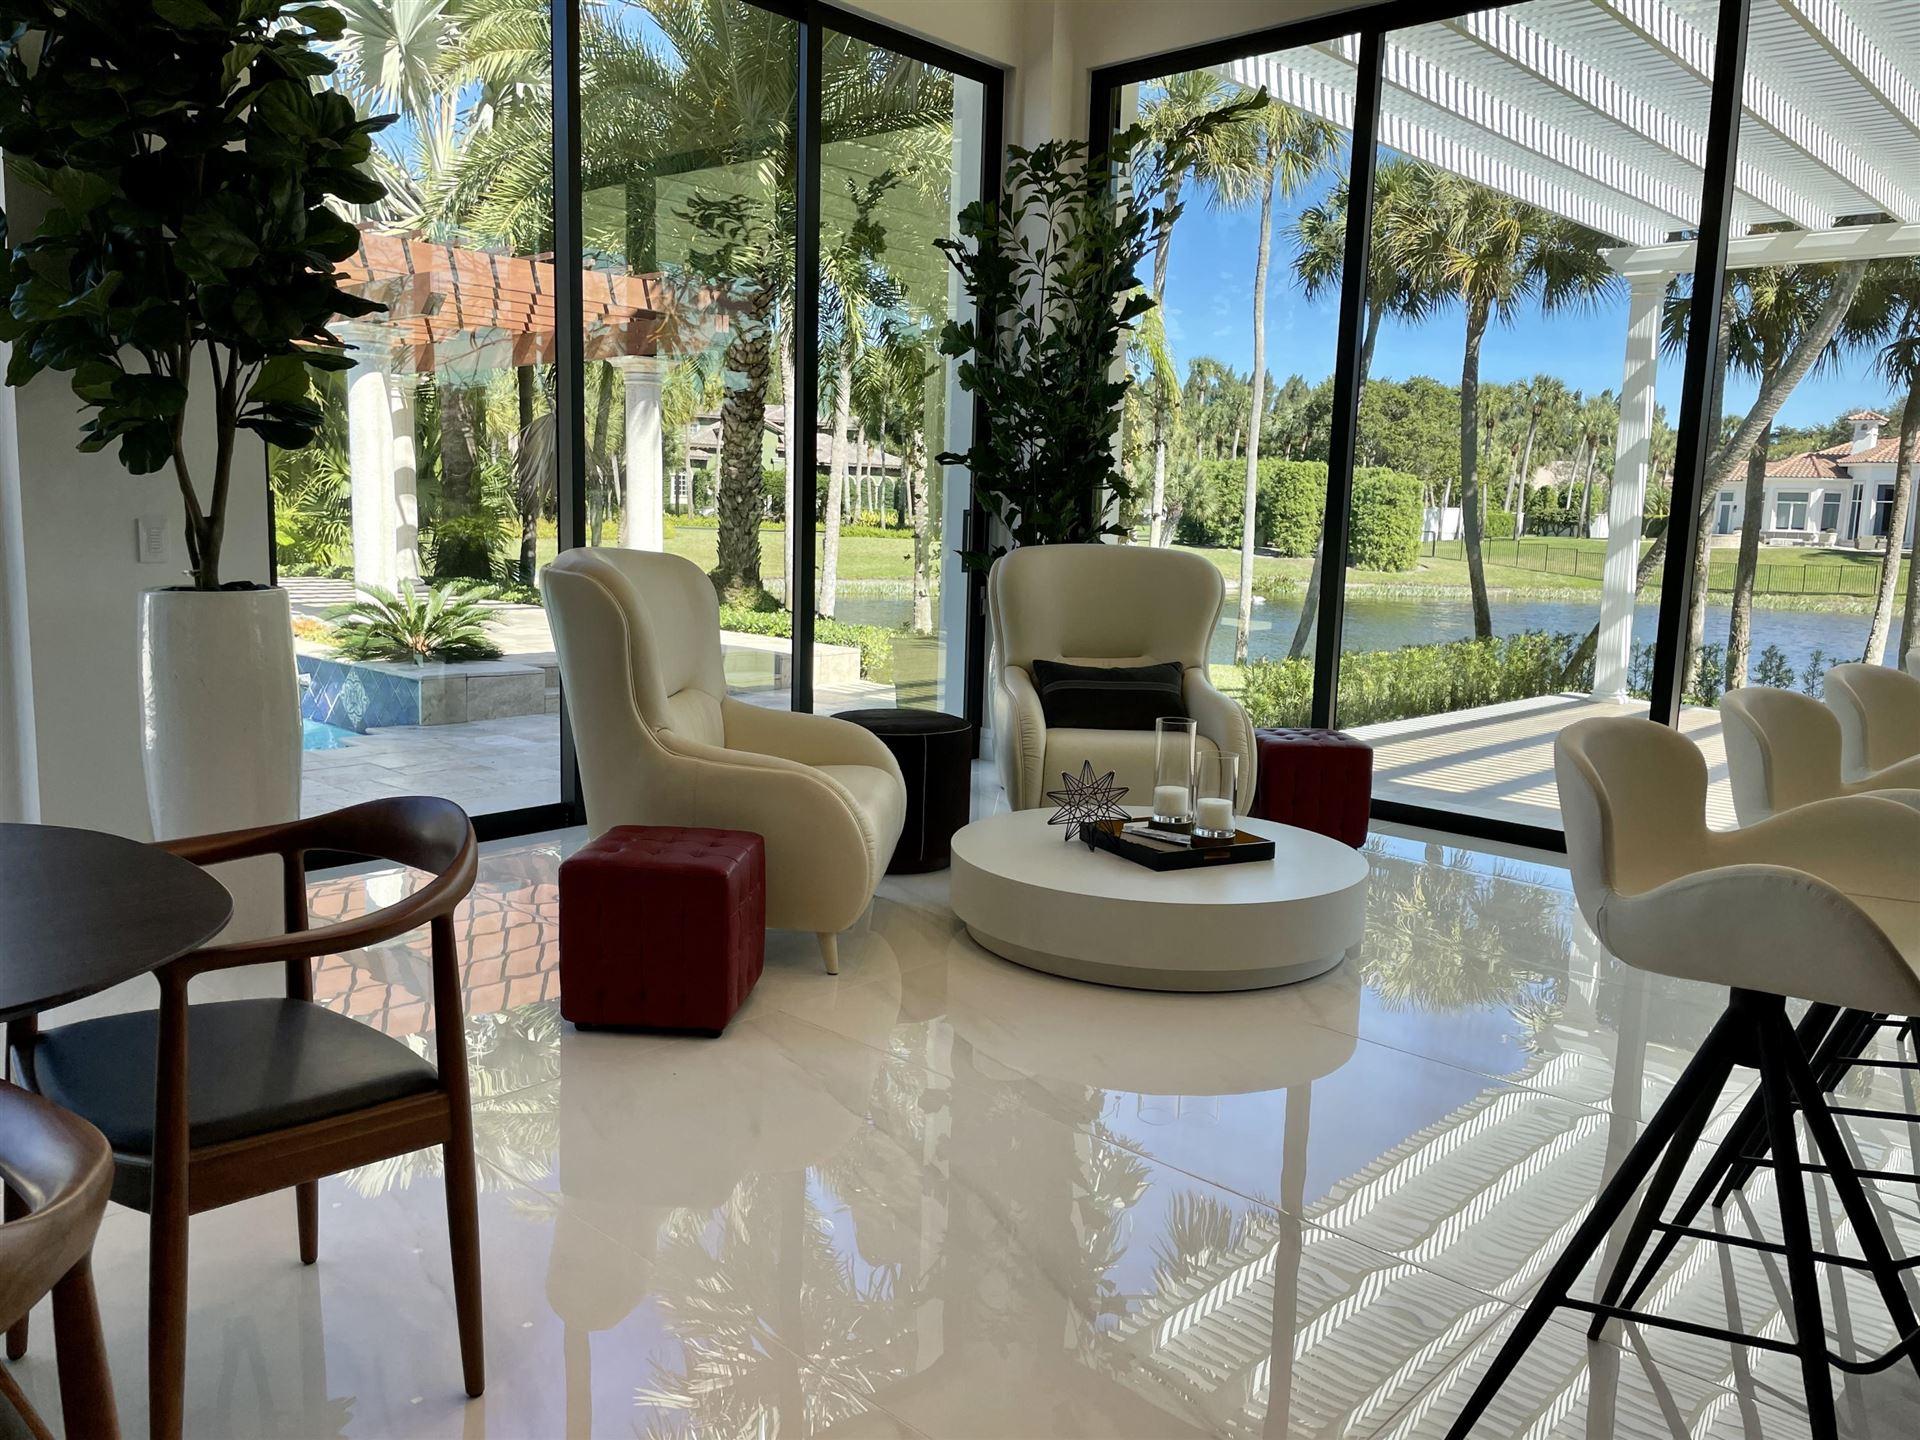 16485 Bridlewood Circle, Delray Beach, FL 33445 - #: RX-10653553